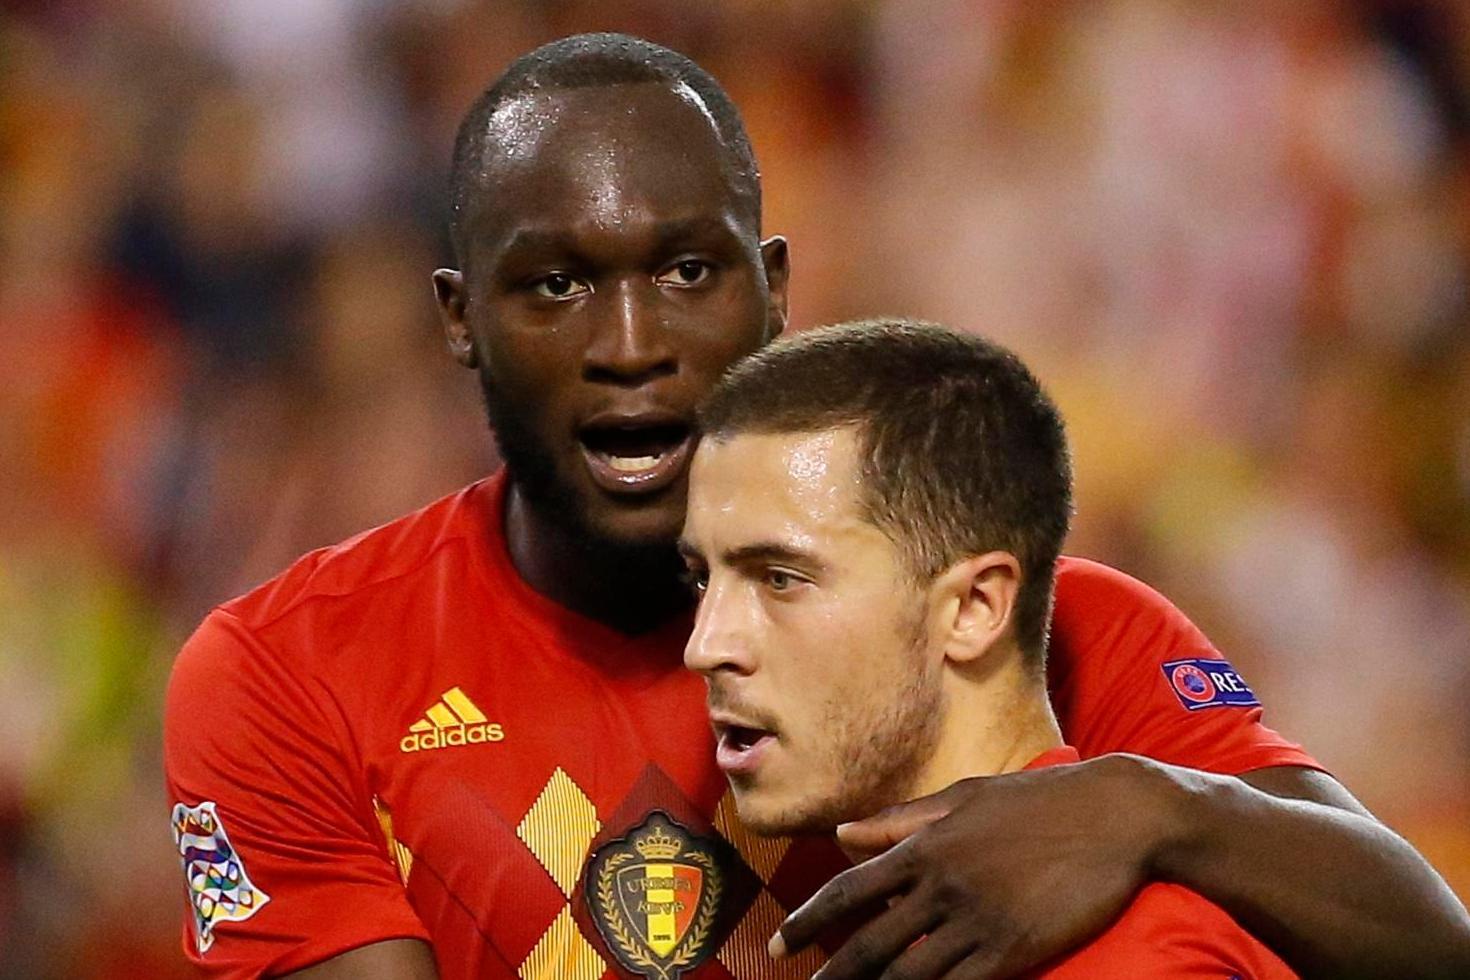 Belgium 2 Switzerland 1: Romelu Lukaku scores twice as Roberto Martinez's men go top of Nations League group